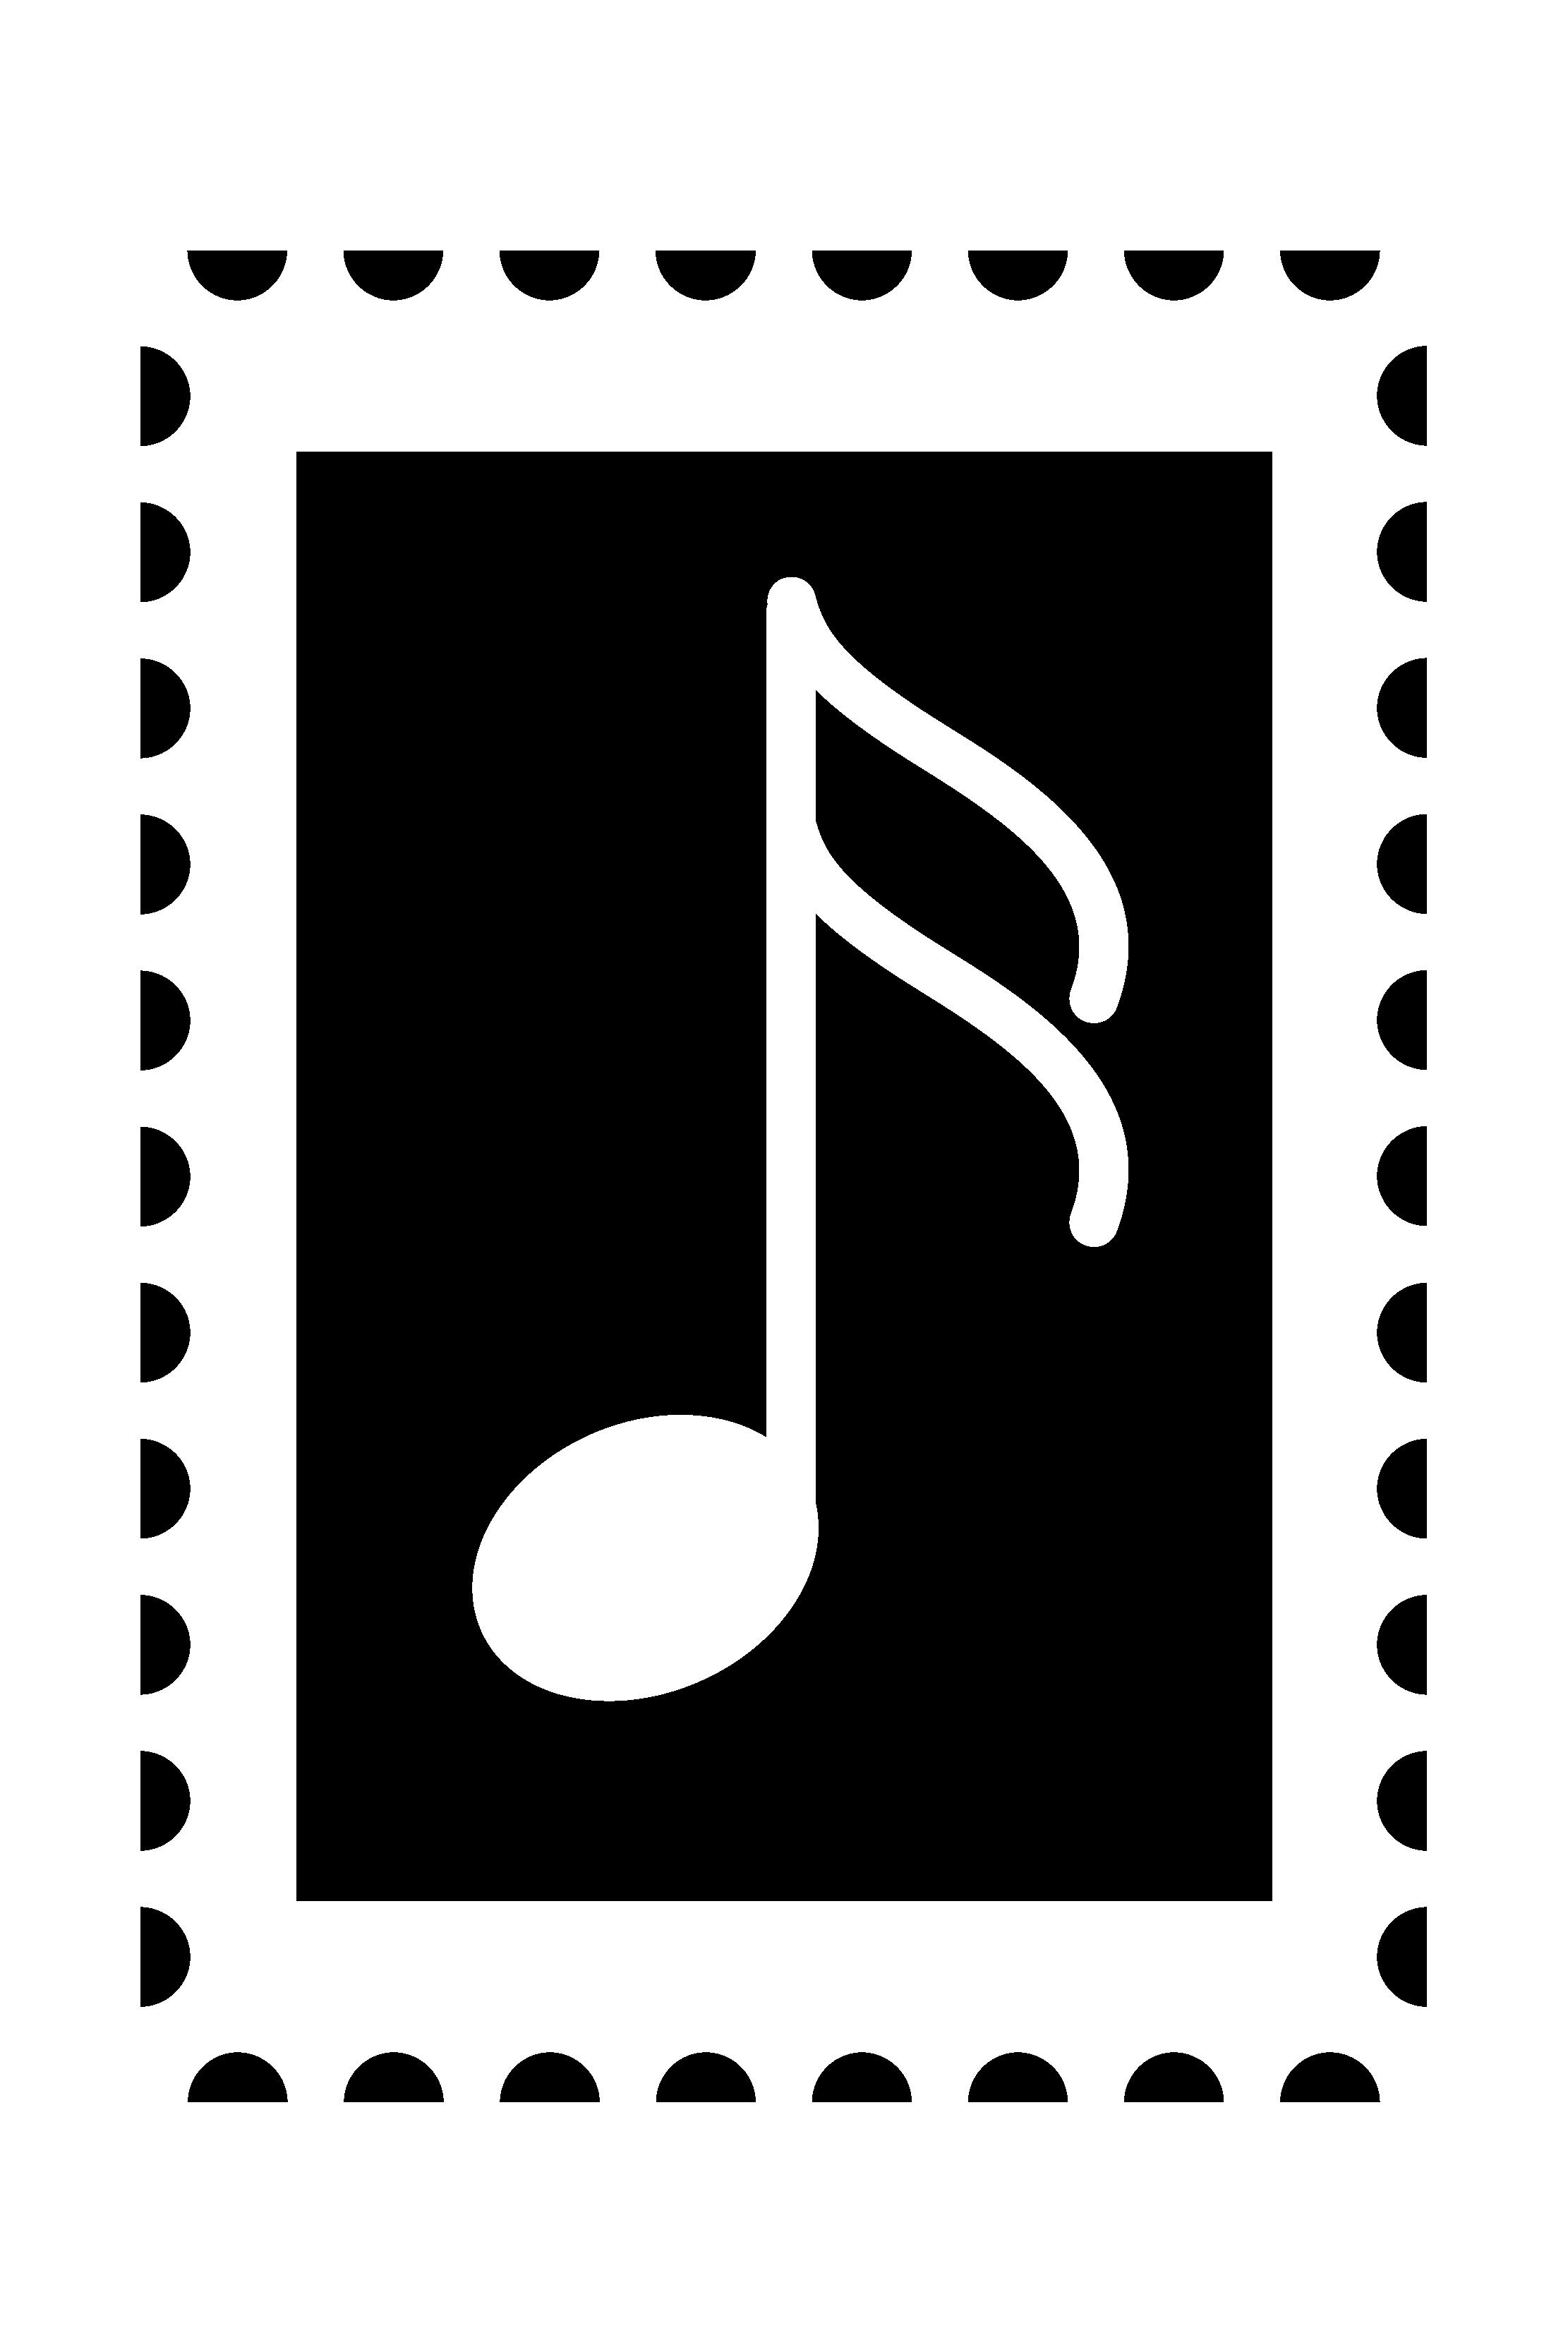 Bardic Post